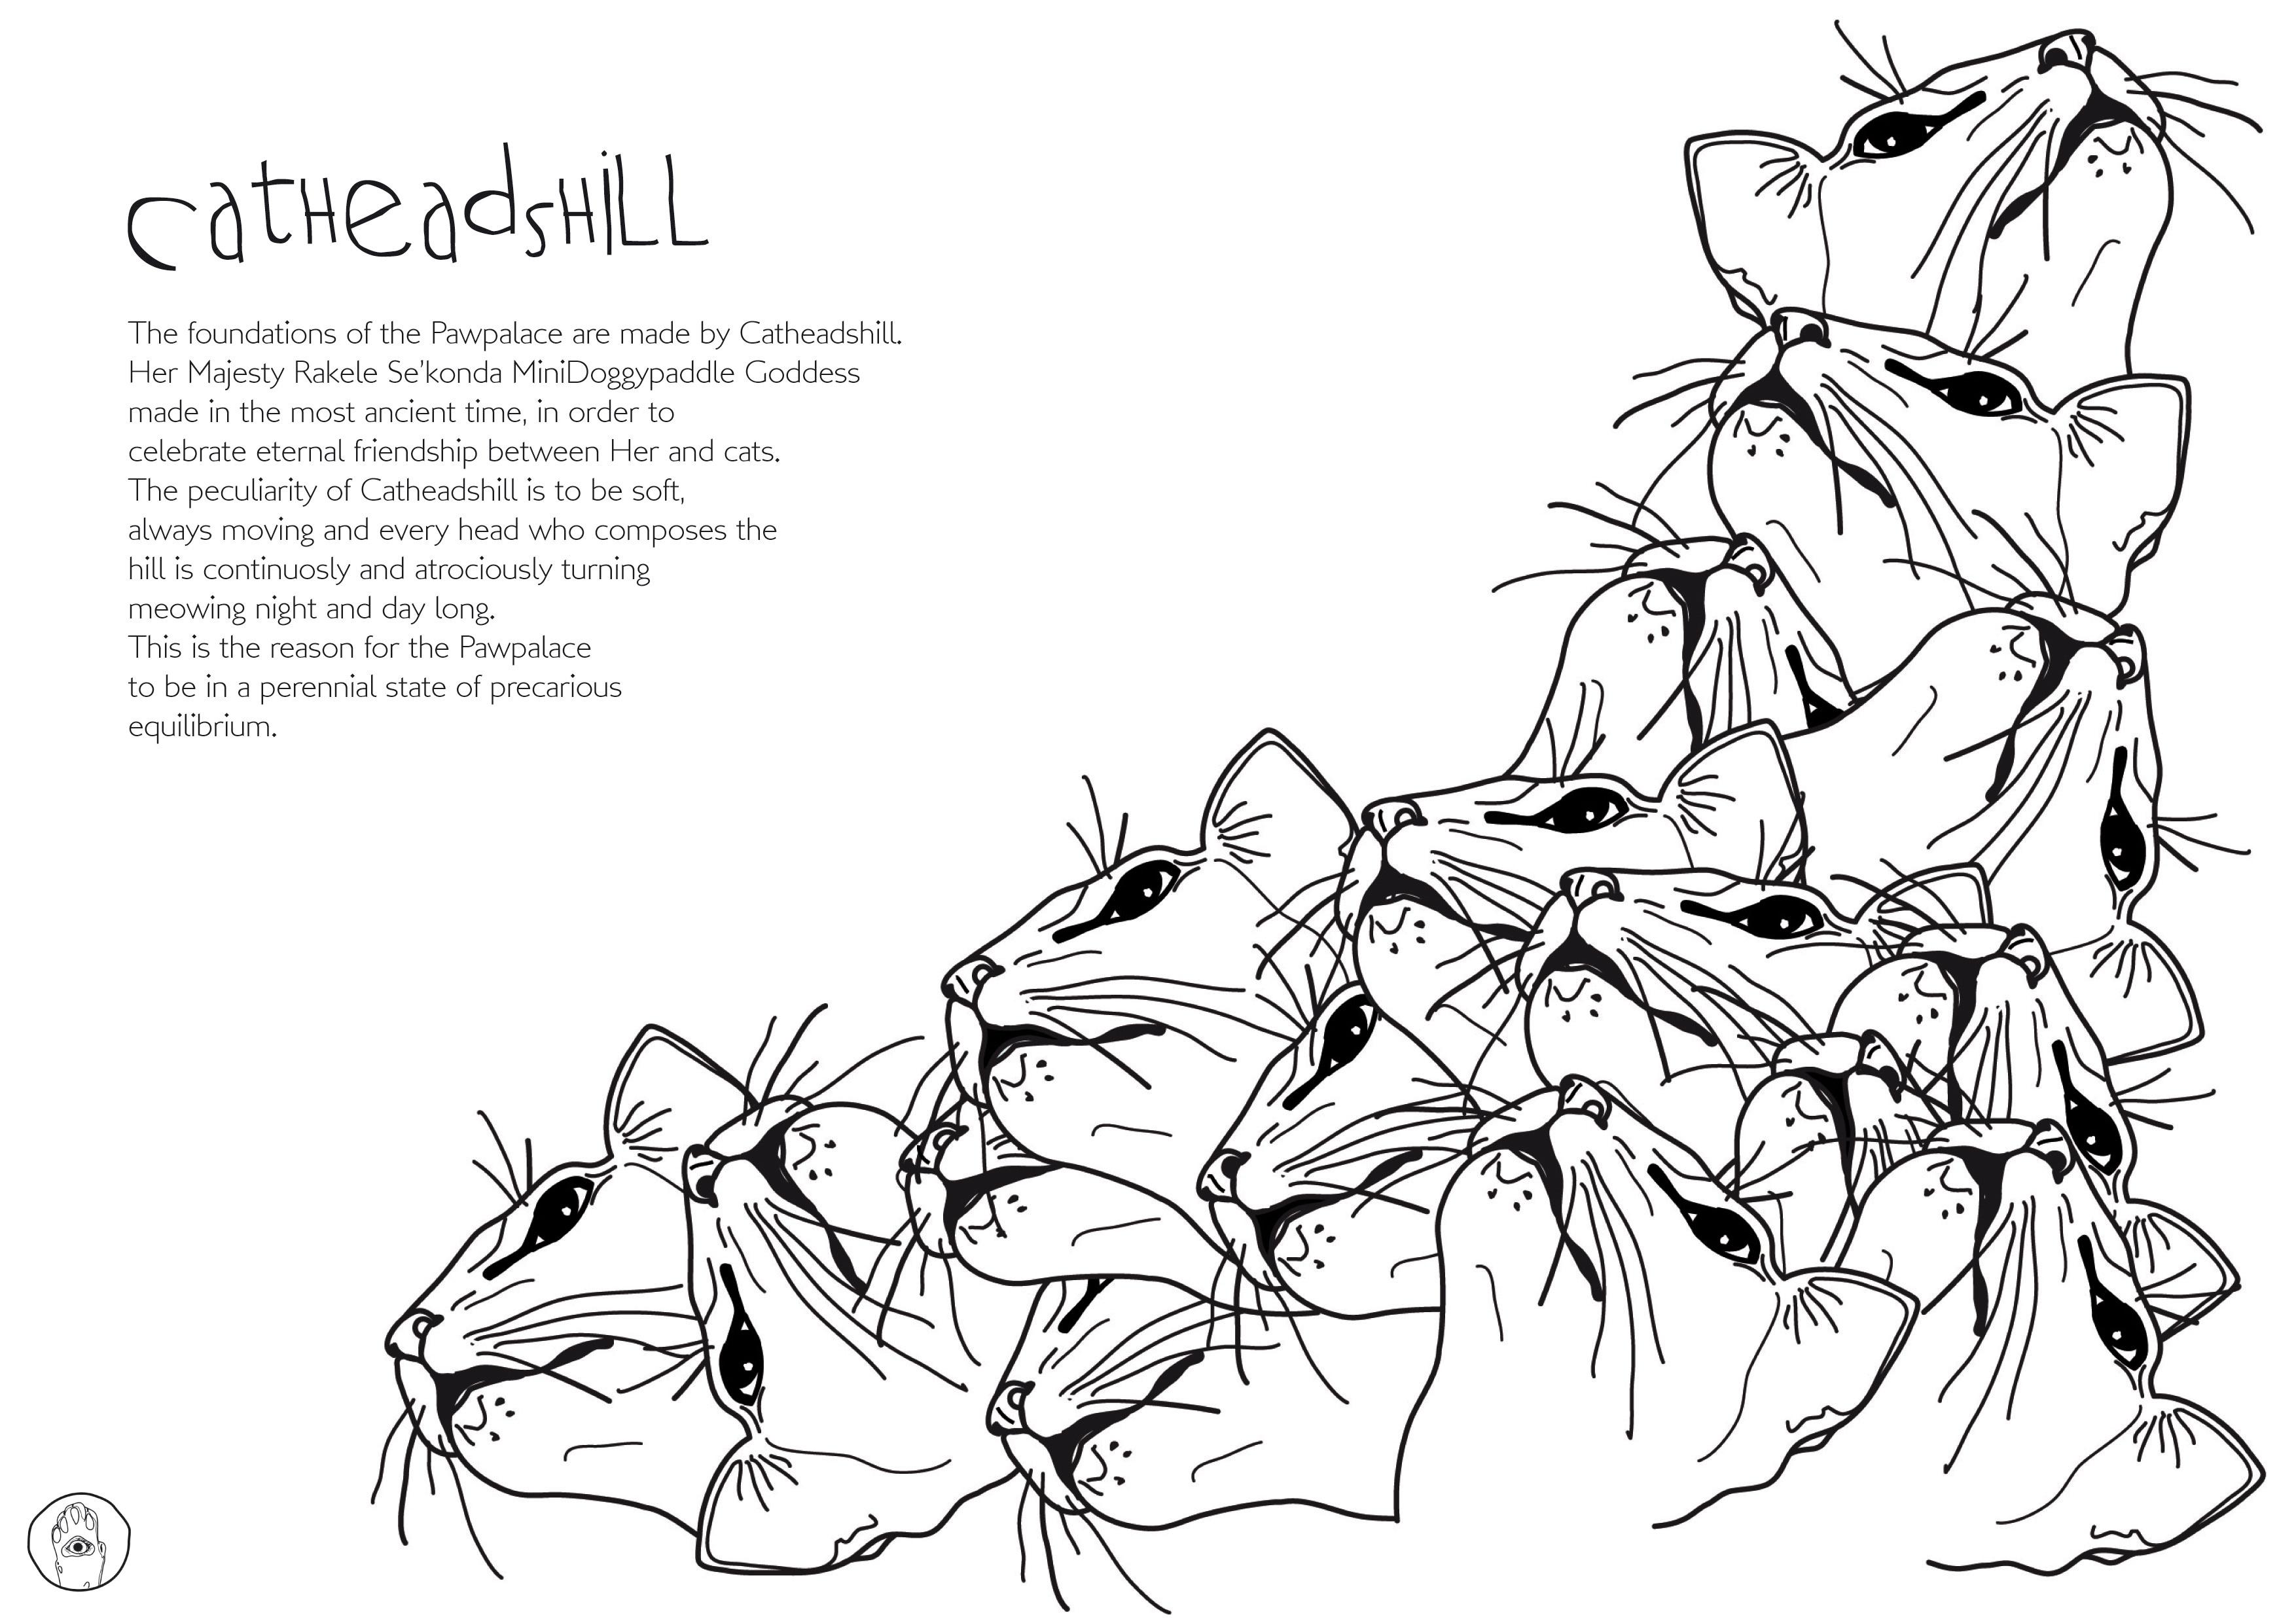 catheadshill